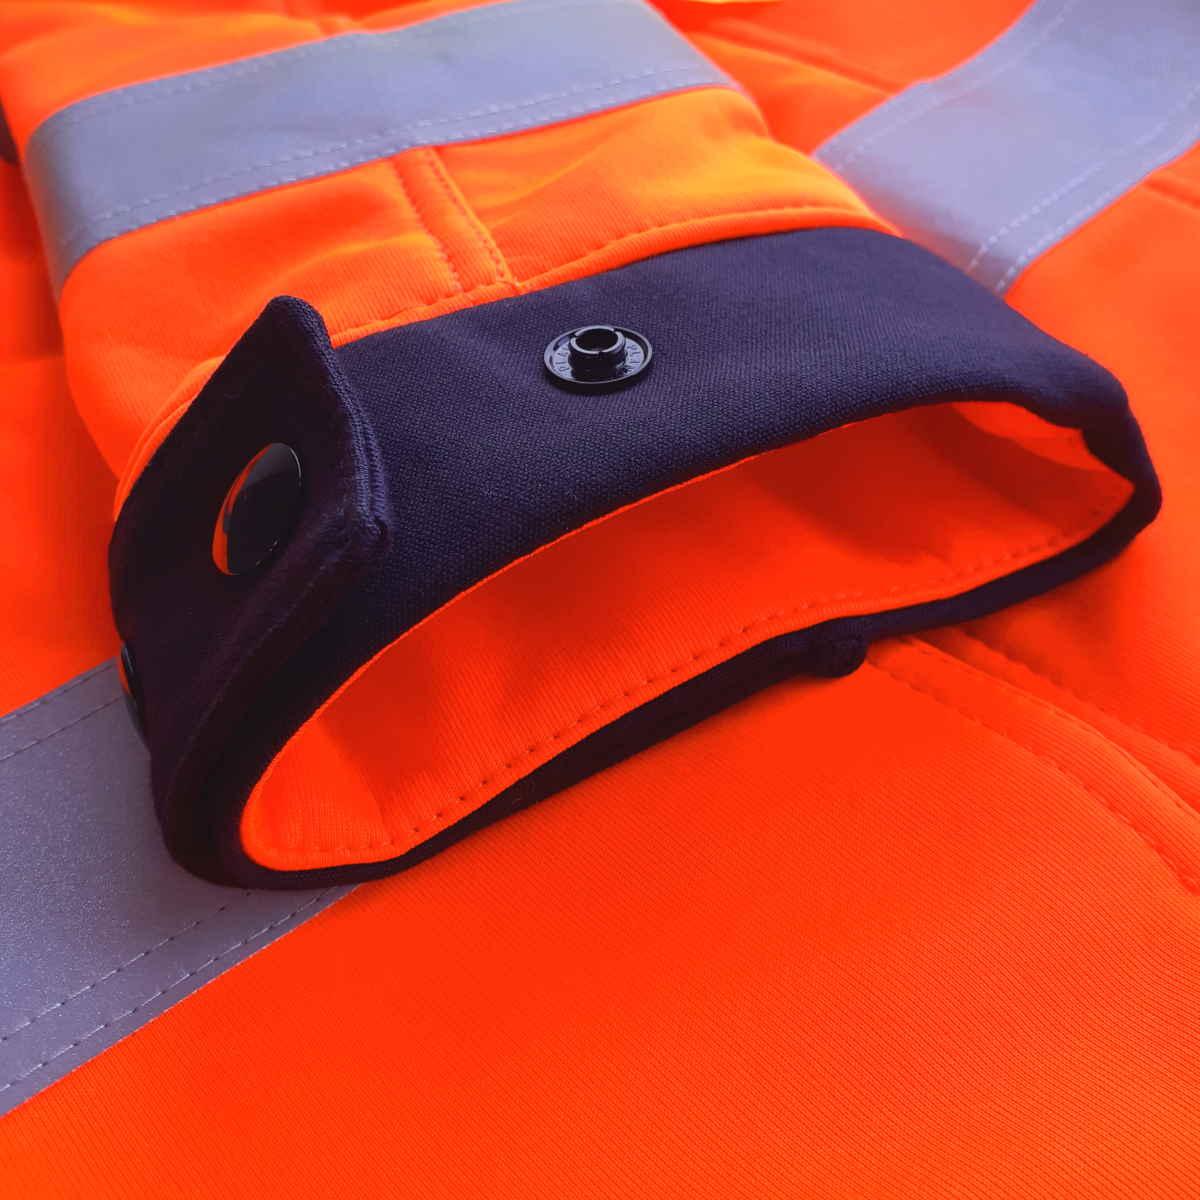 AS0059 HAZTEC® Cossack FR AS Hi-Vis Softshell Jacket_Adjustable Cuff